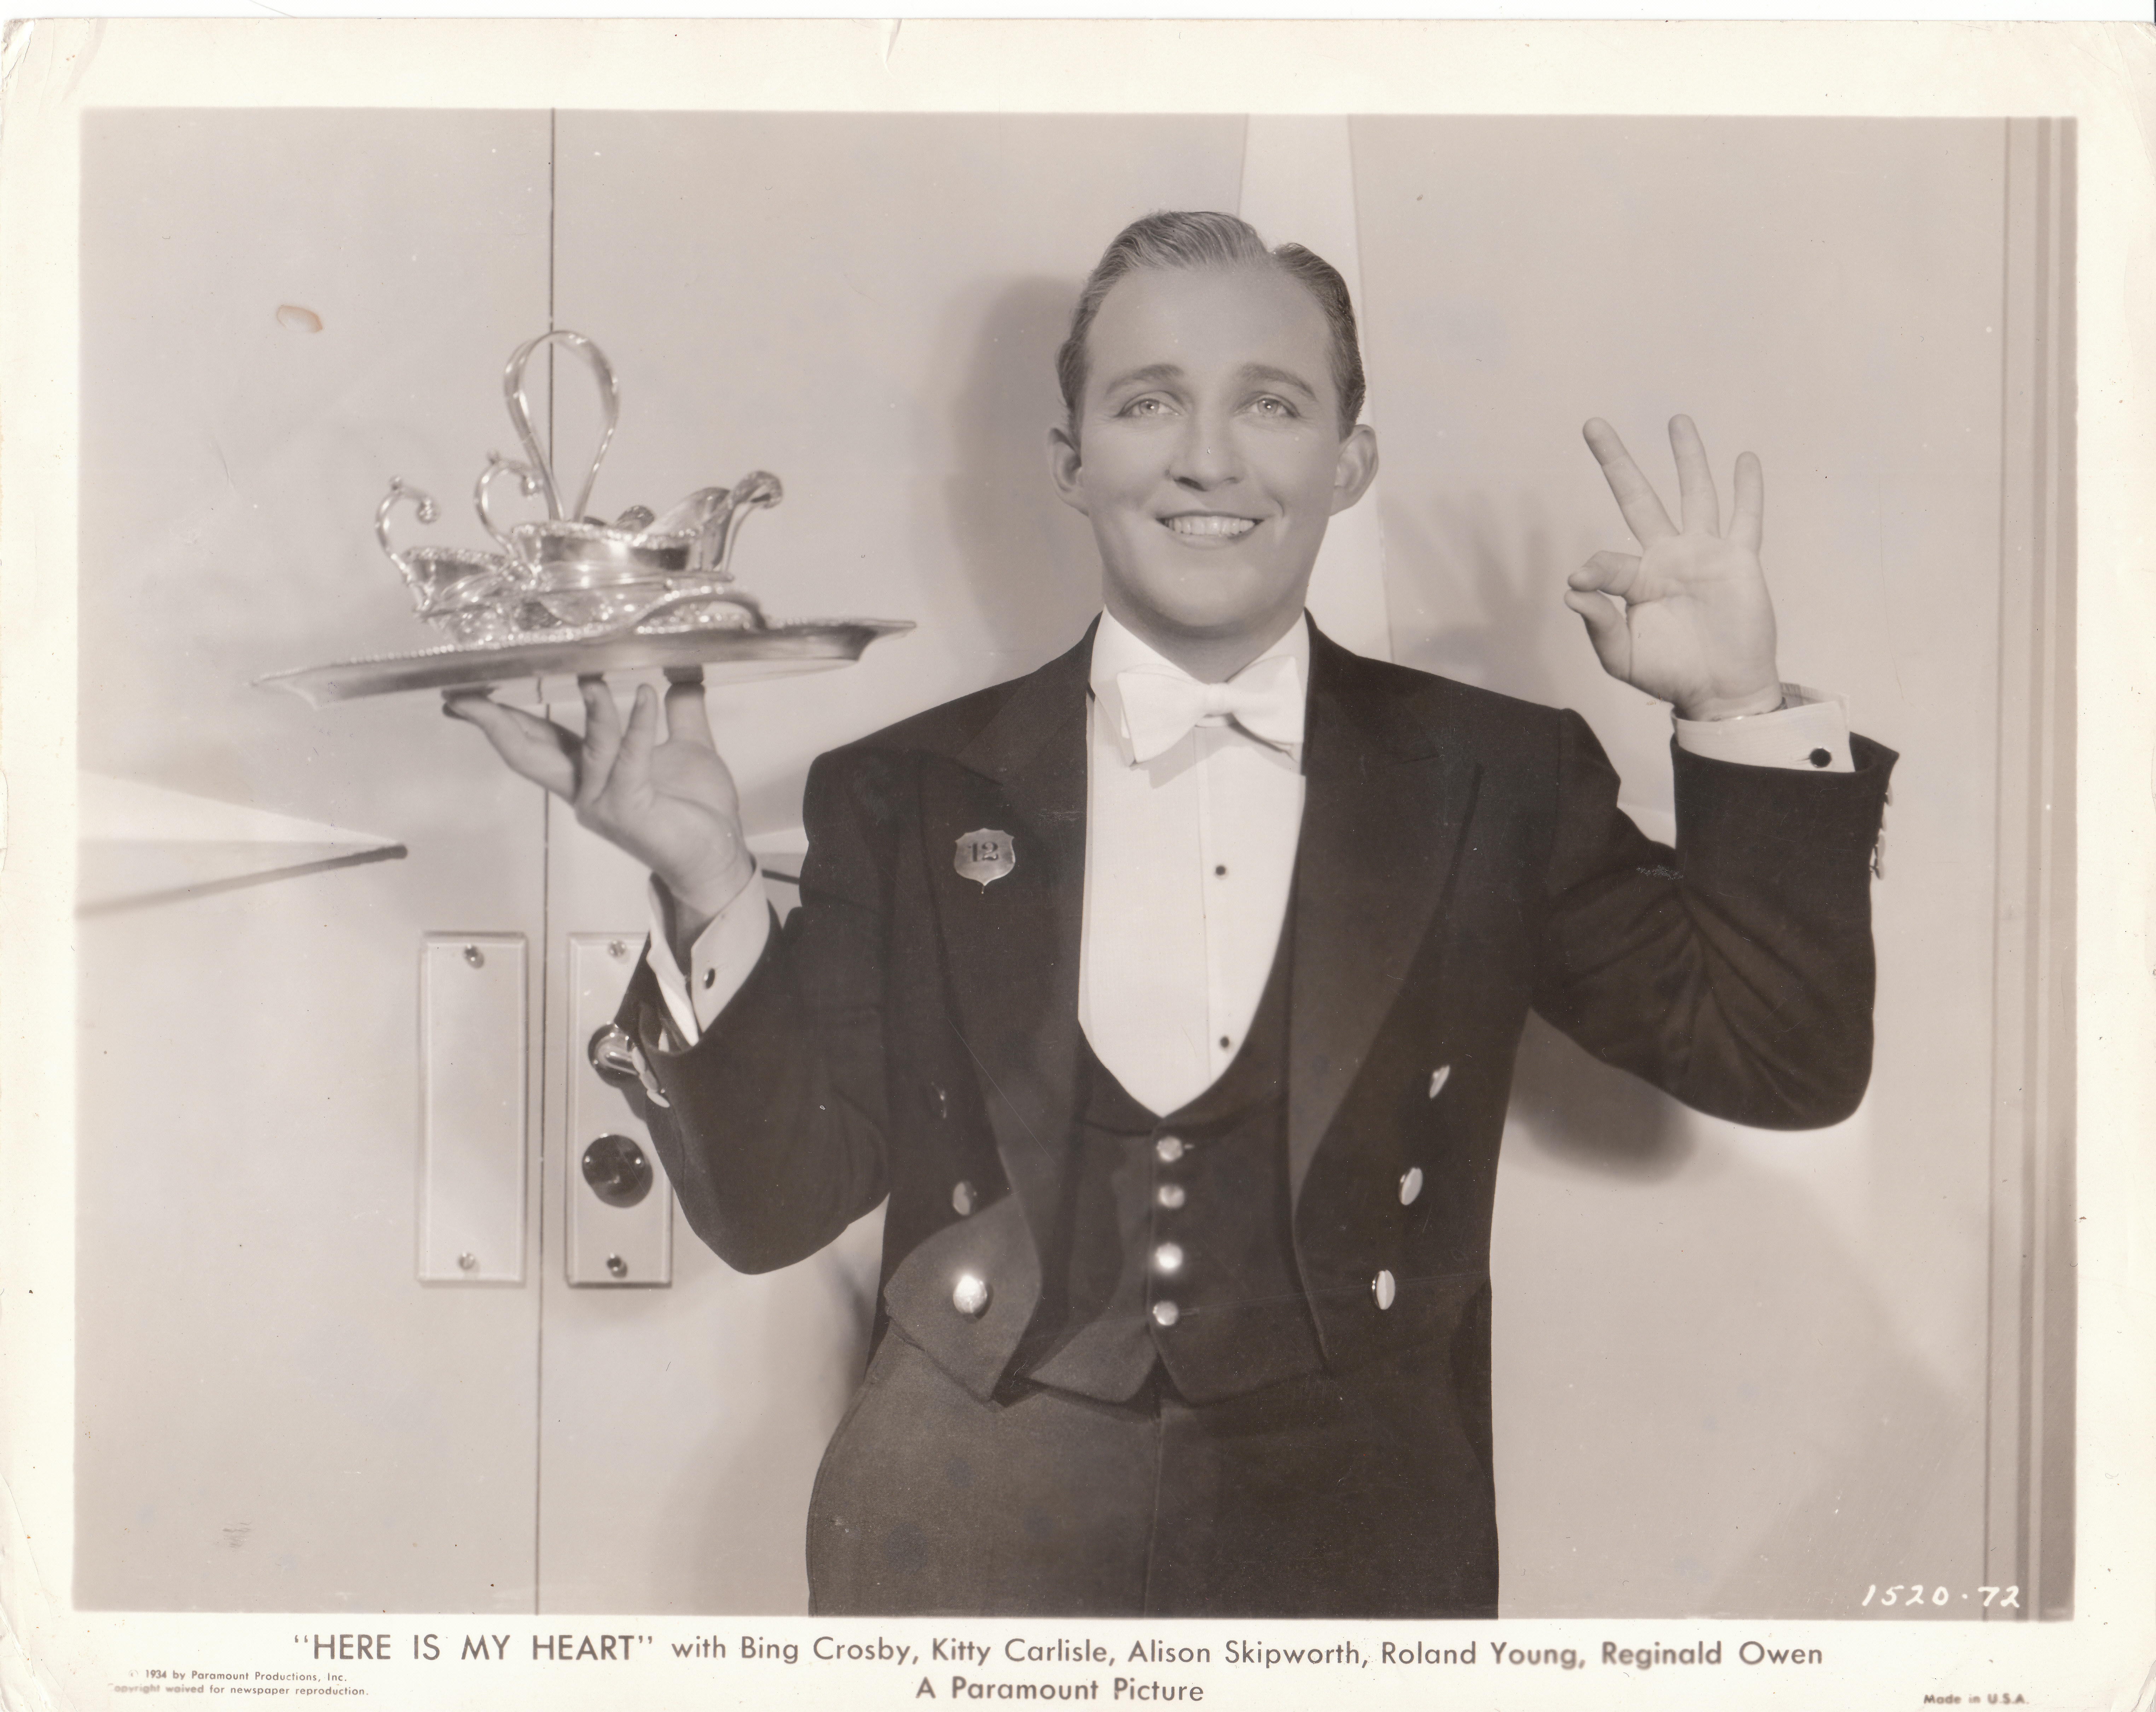 Bing Crosby in Here Is My Heart (1934)